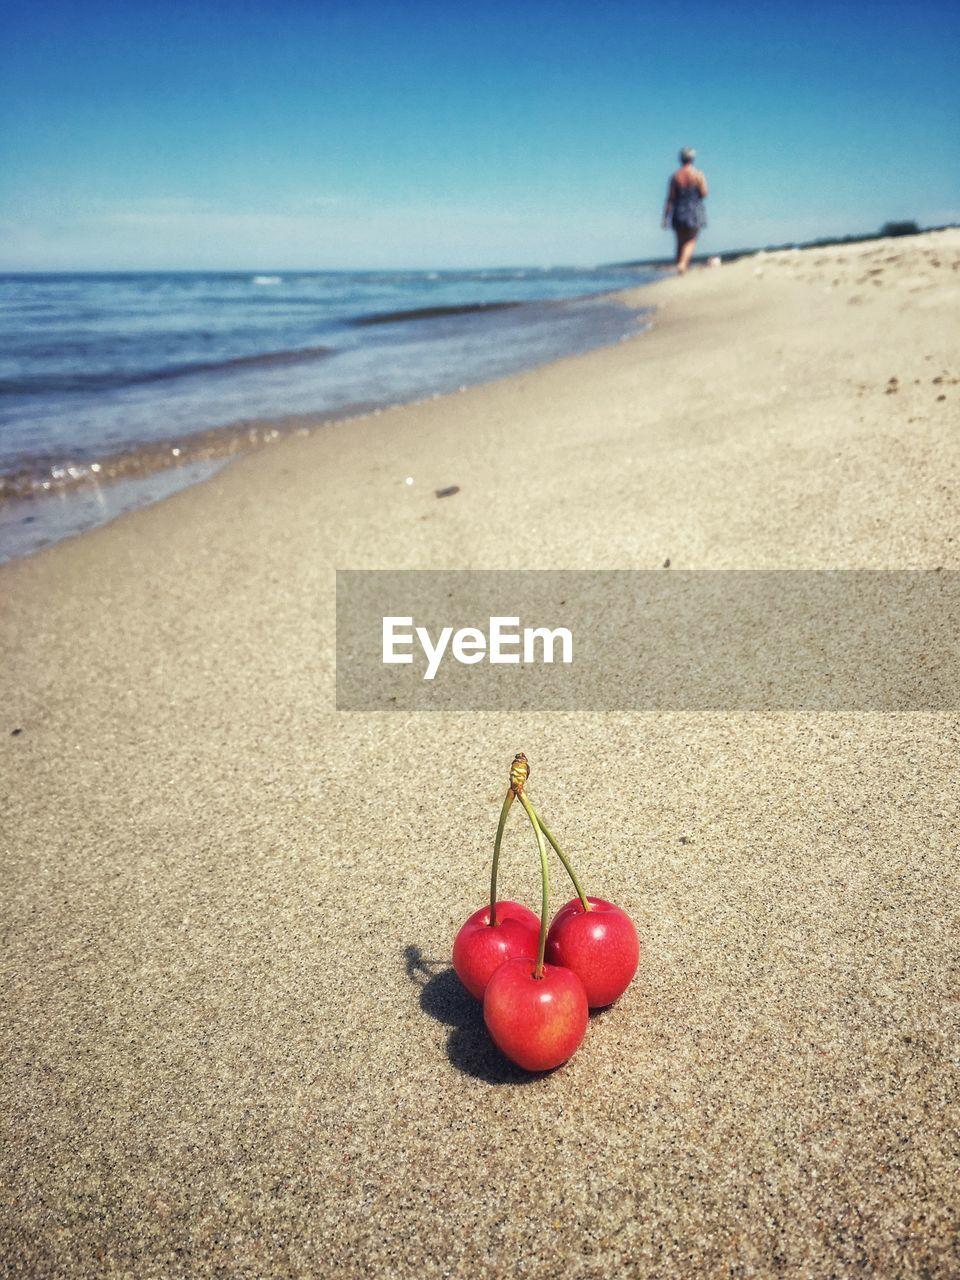 Cherries on sand at beach